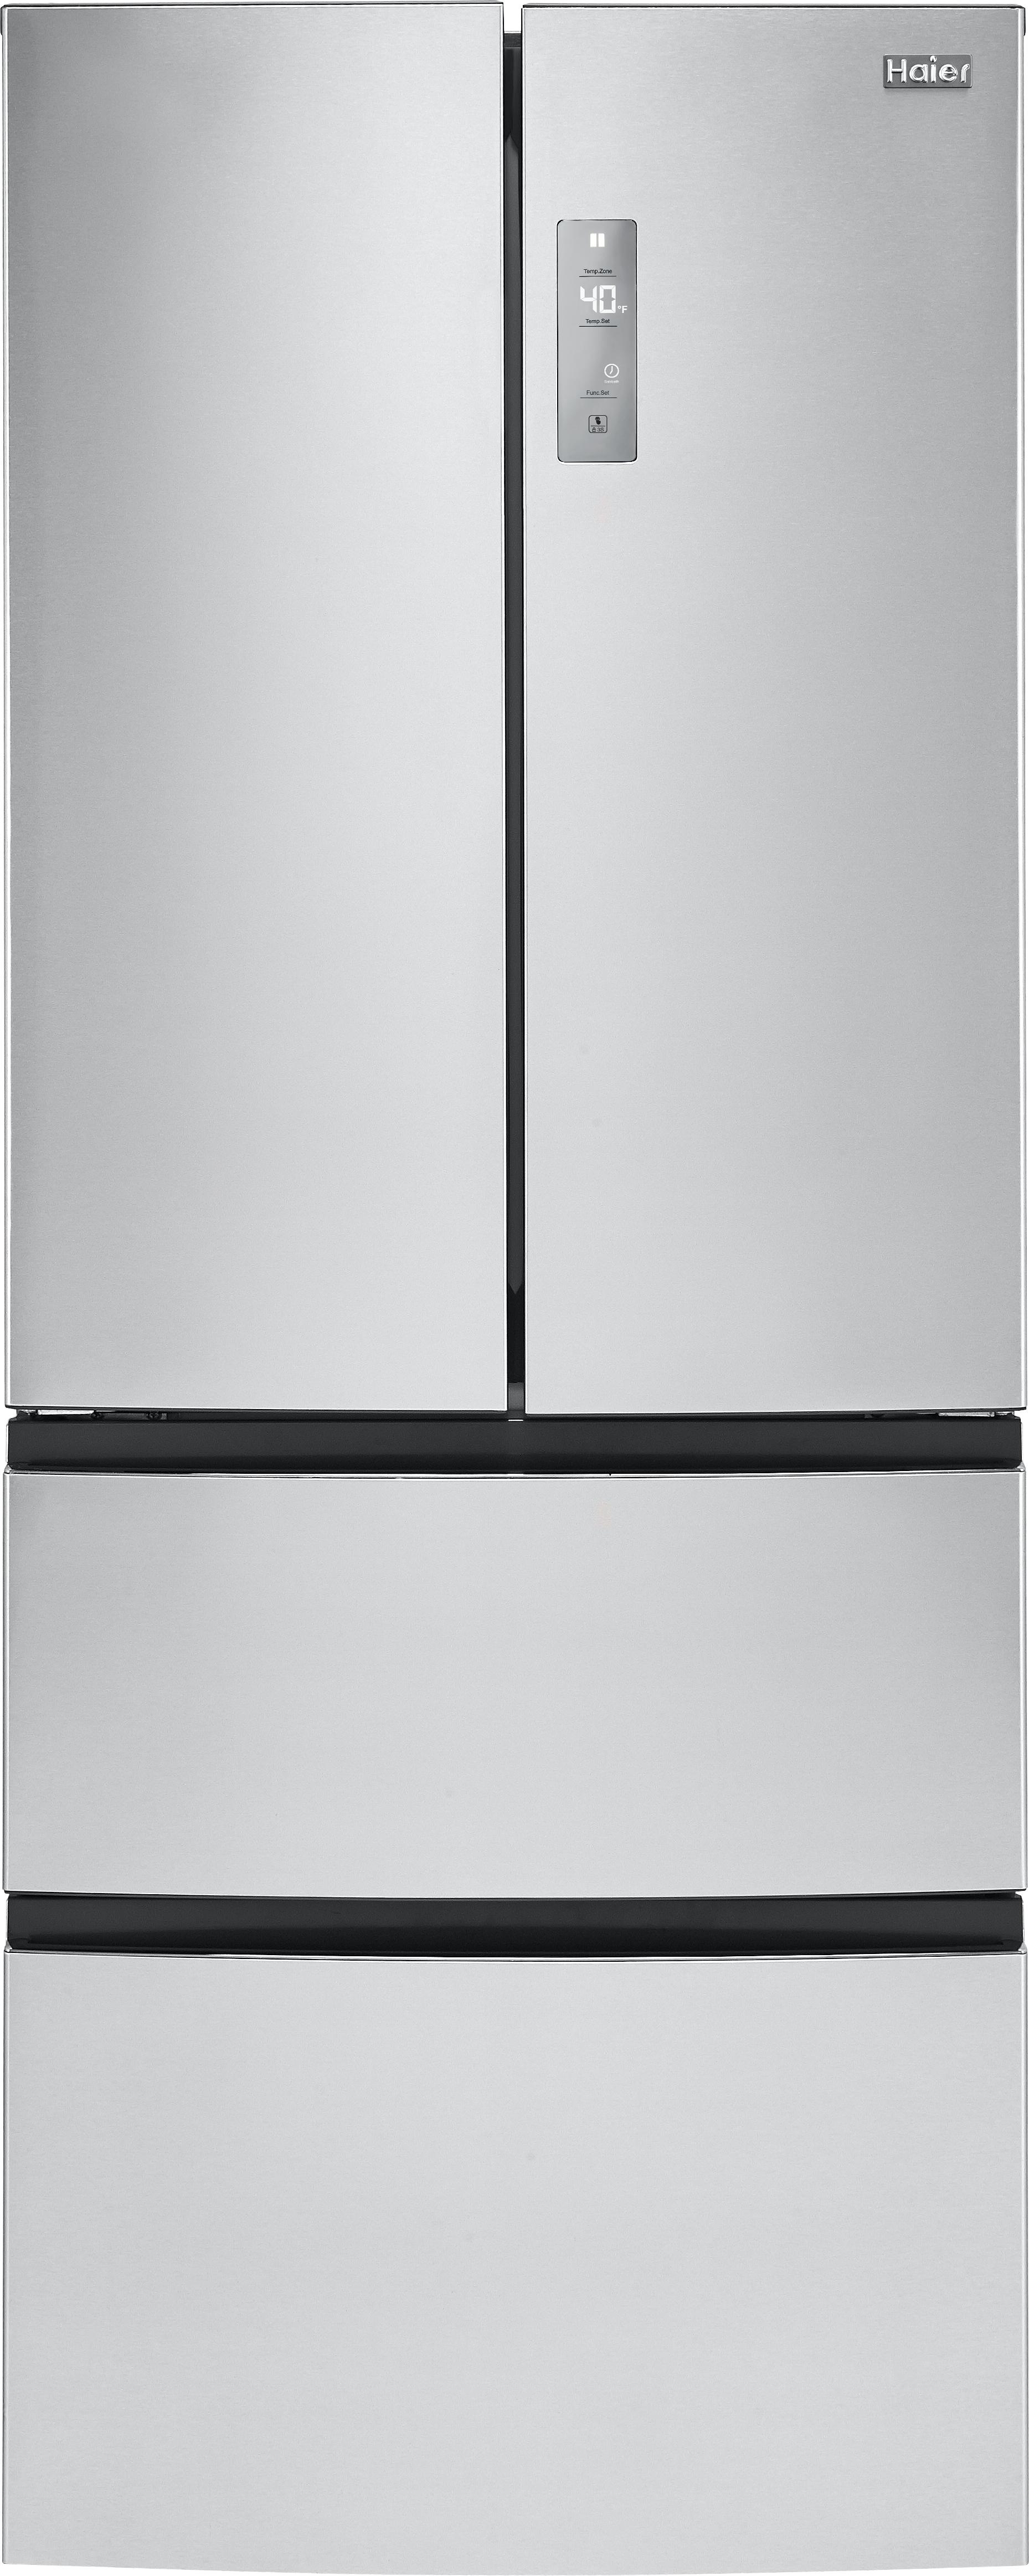 Side by side refrigerator 30 inch width - Side By Side Refrigerator 30 Inch Width 17